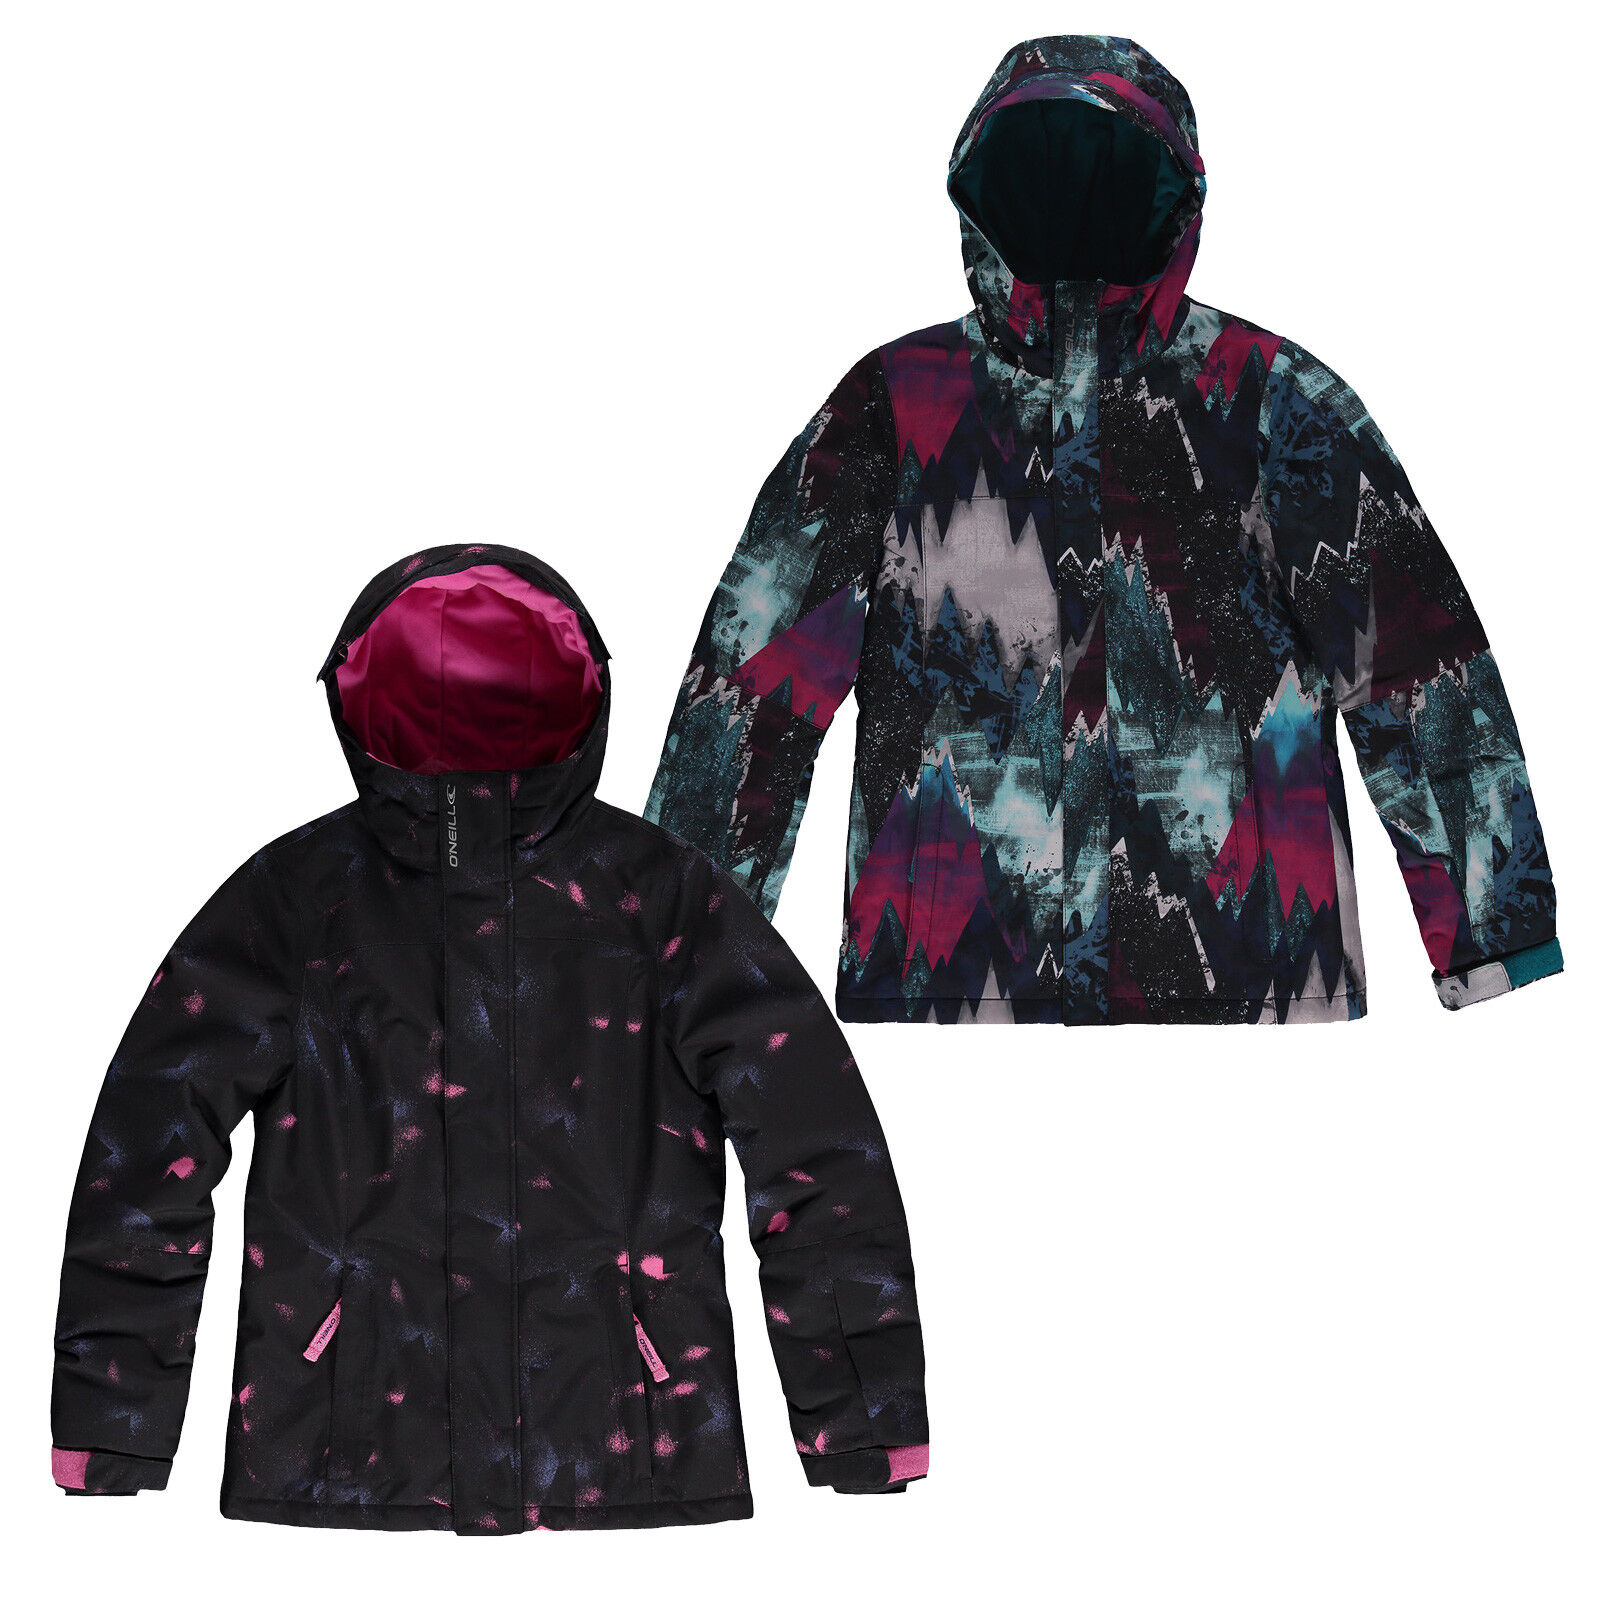 ONeill O'Neill Dazzle Jacke Kinder-Winterjacke Skijacke Funktionsjacke Snowboard Snowboard Snowboard 8fb47f